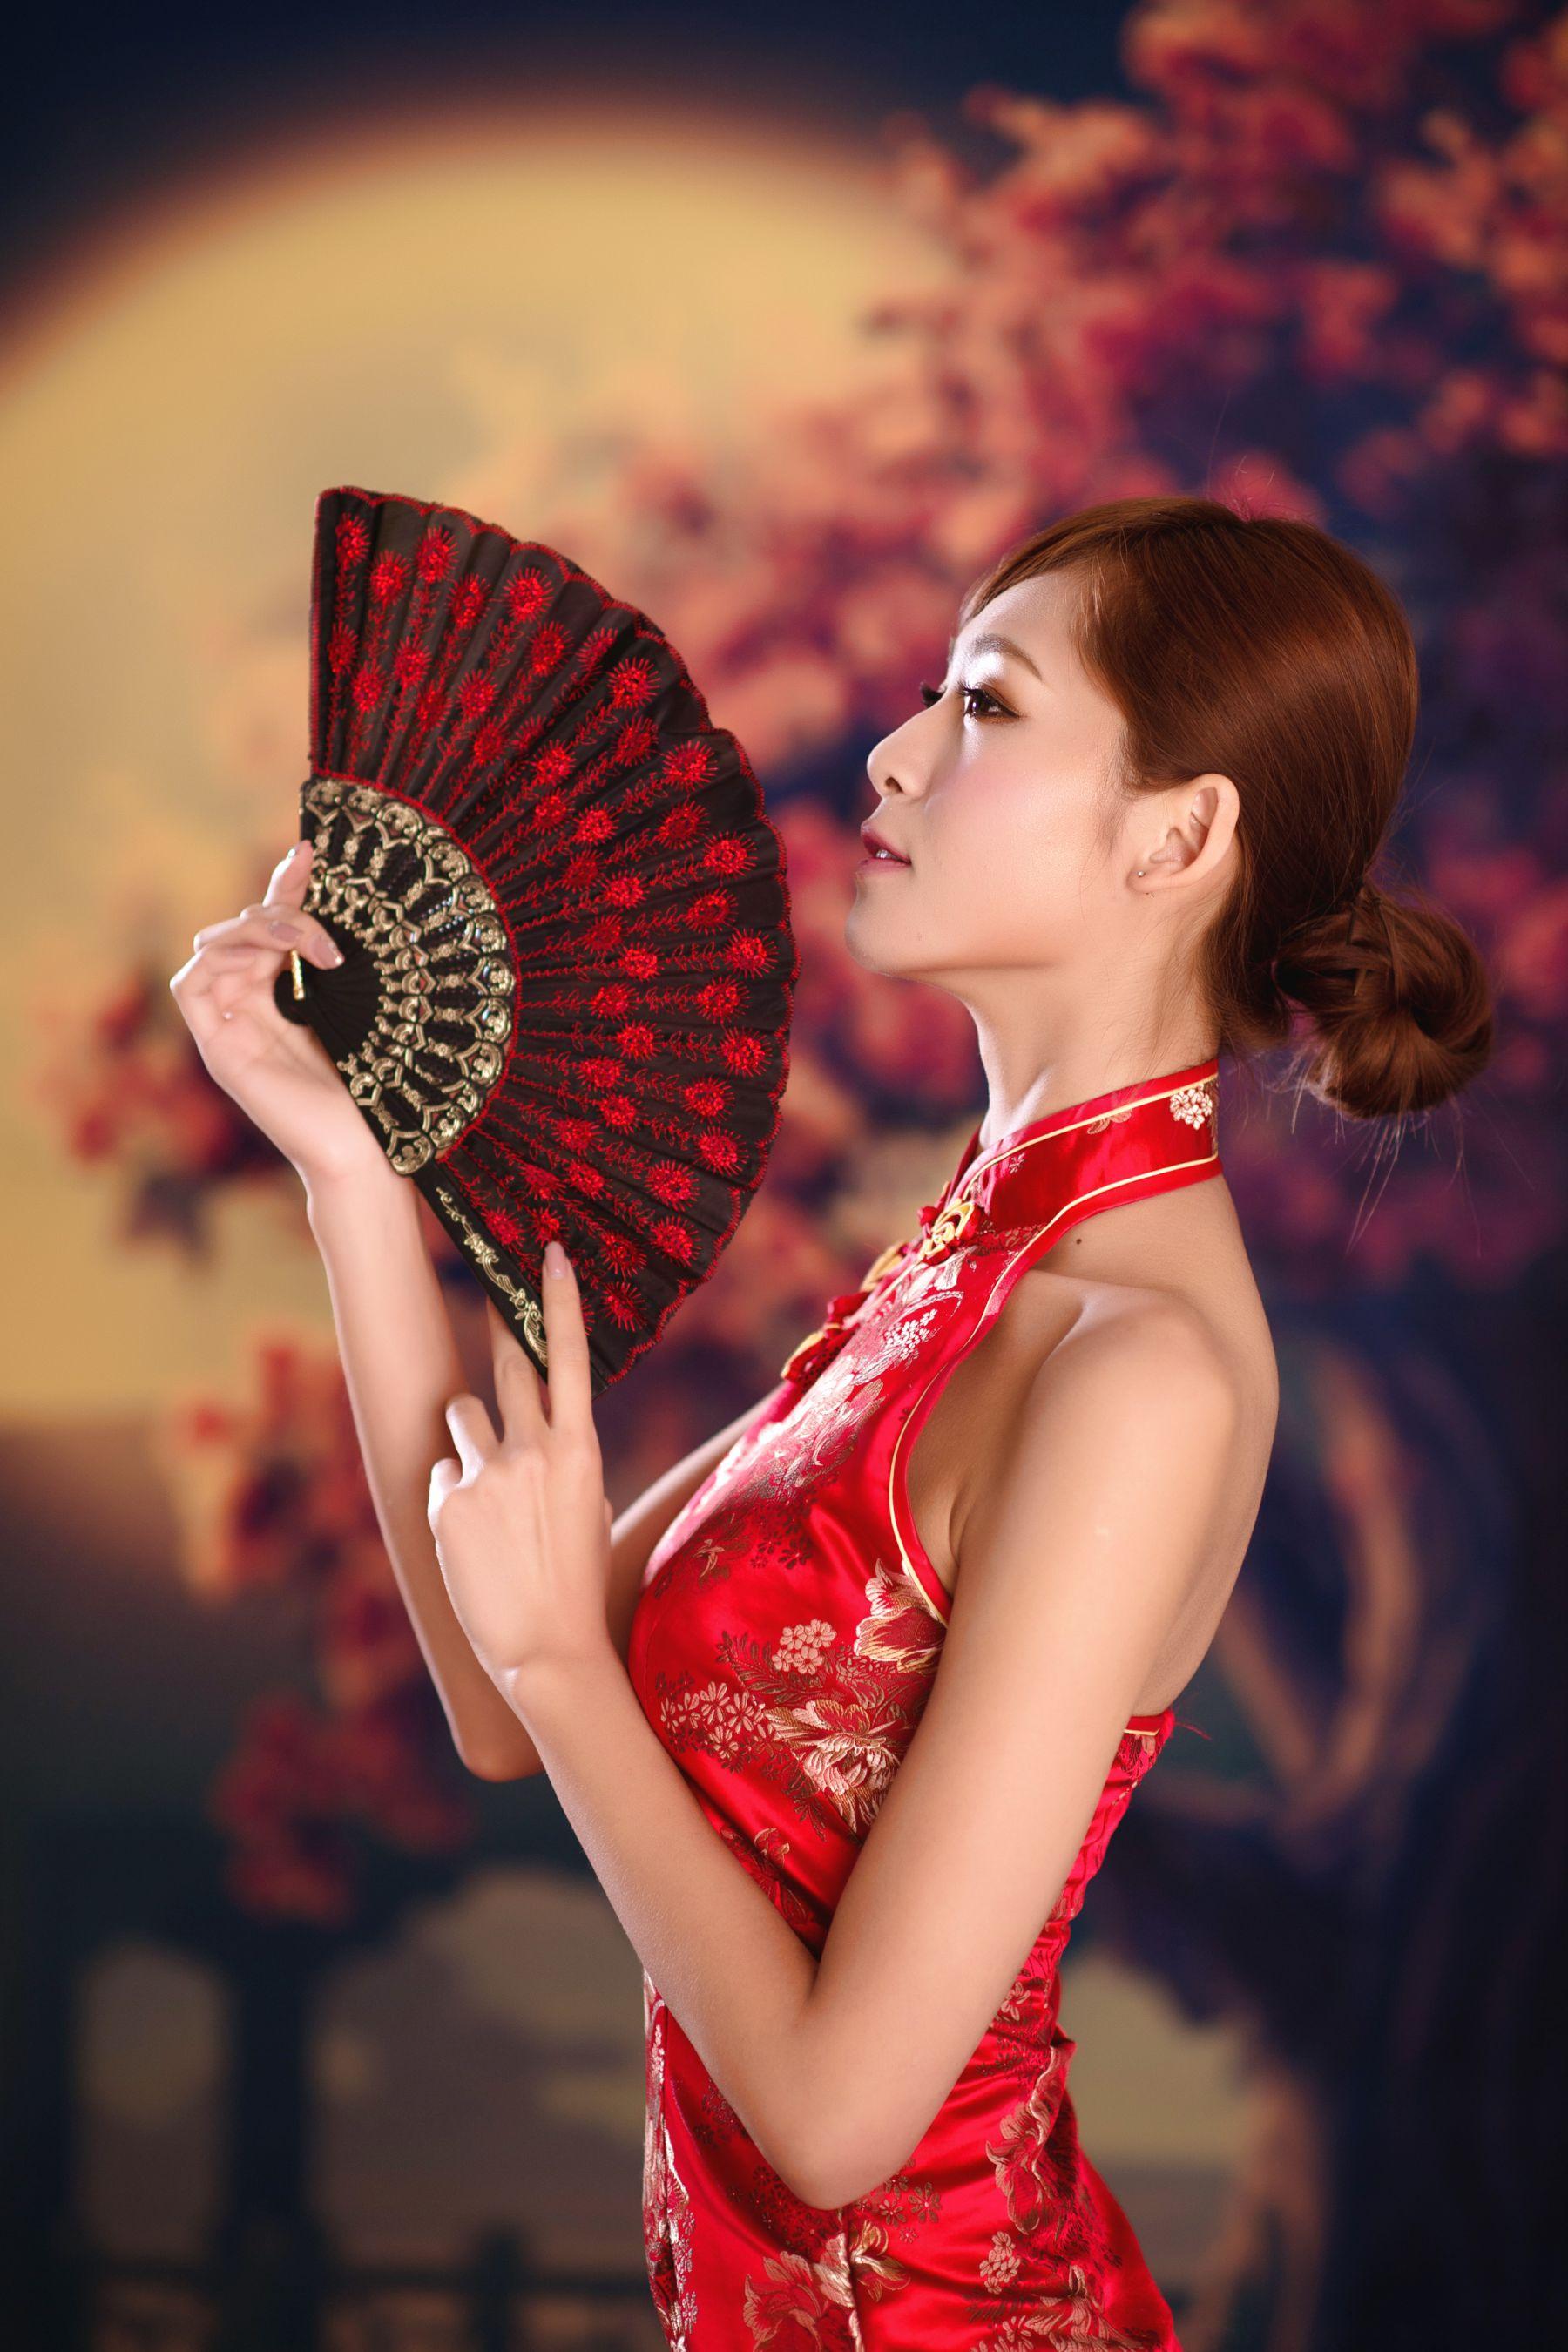 VOL.1760 [网络美女]古典旗袍优雅美女:Winnie小雪(庄咏惠,庄温妮,腿模Winnie)高品质写真套图(42P)